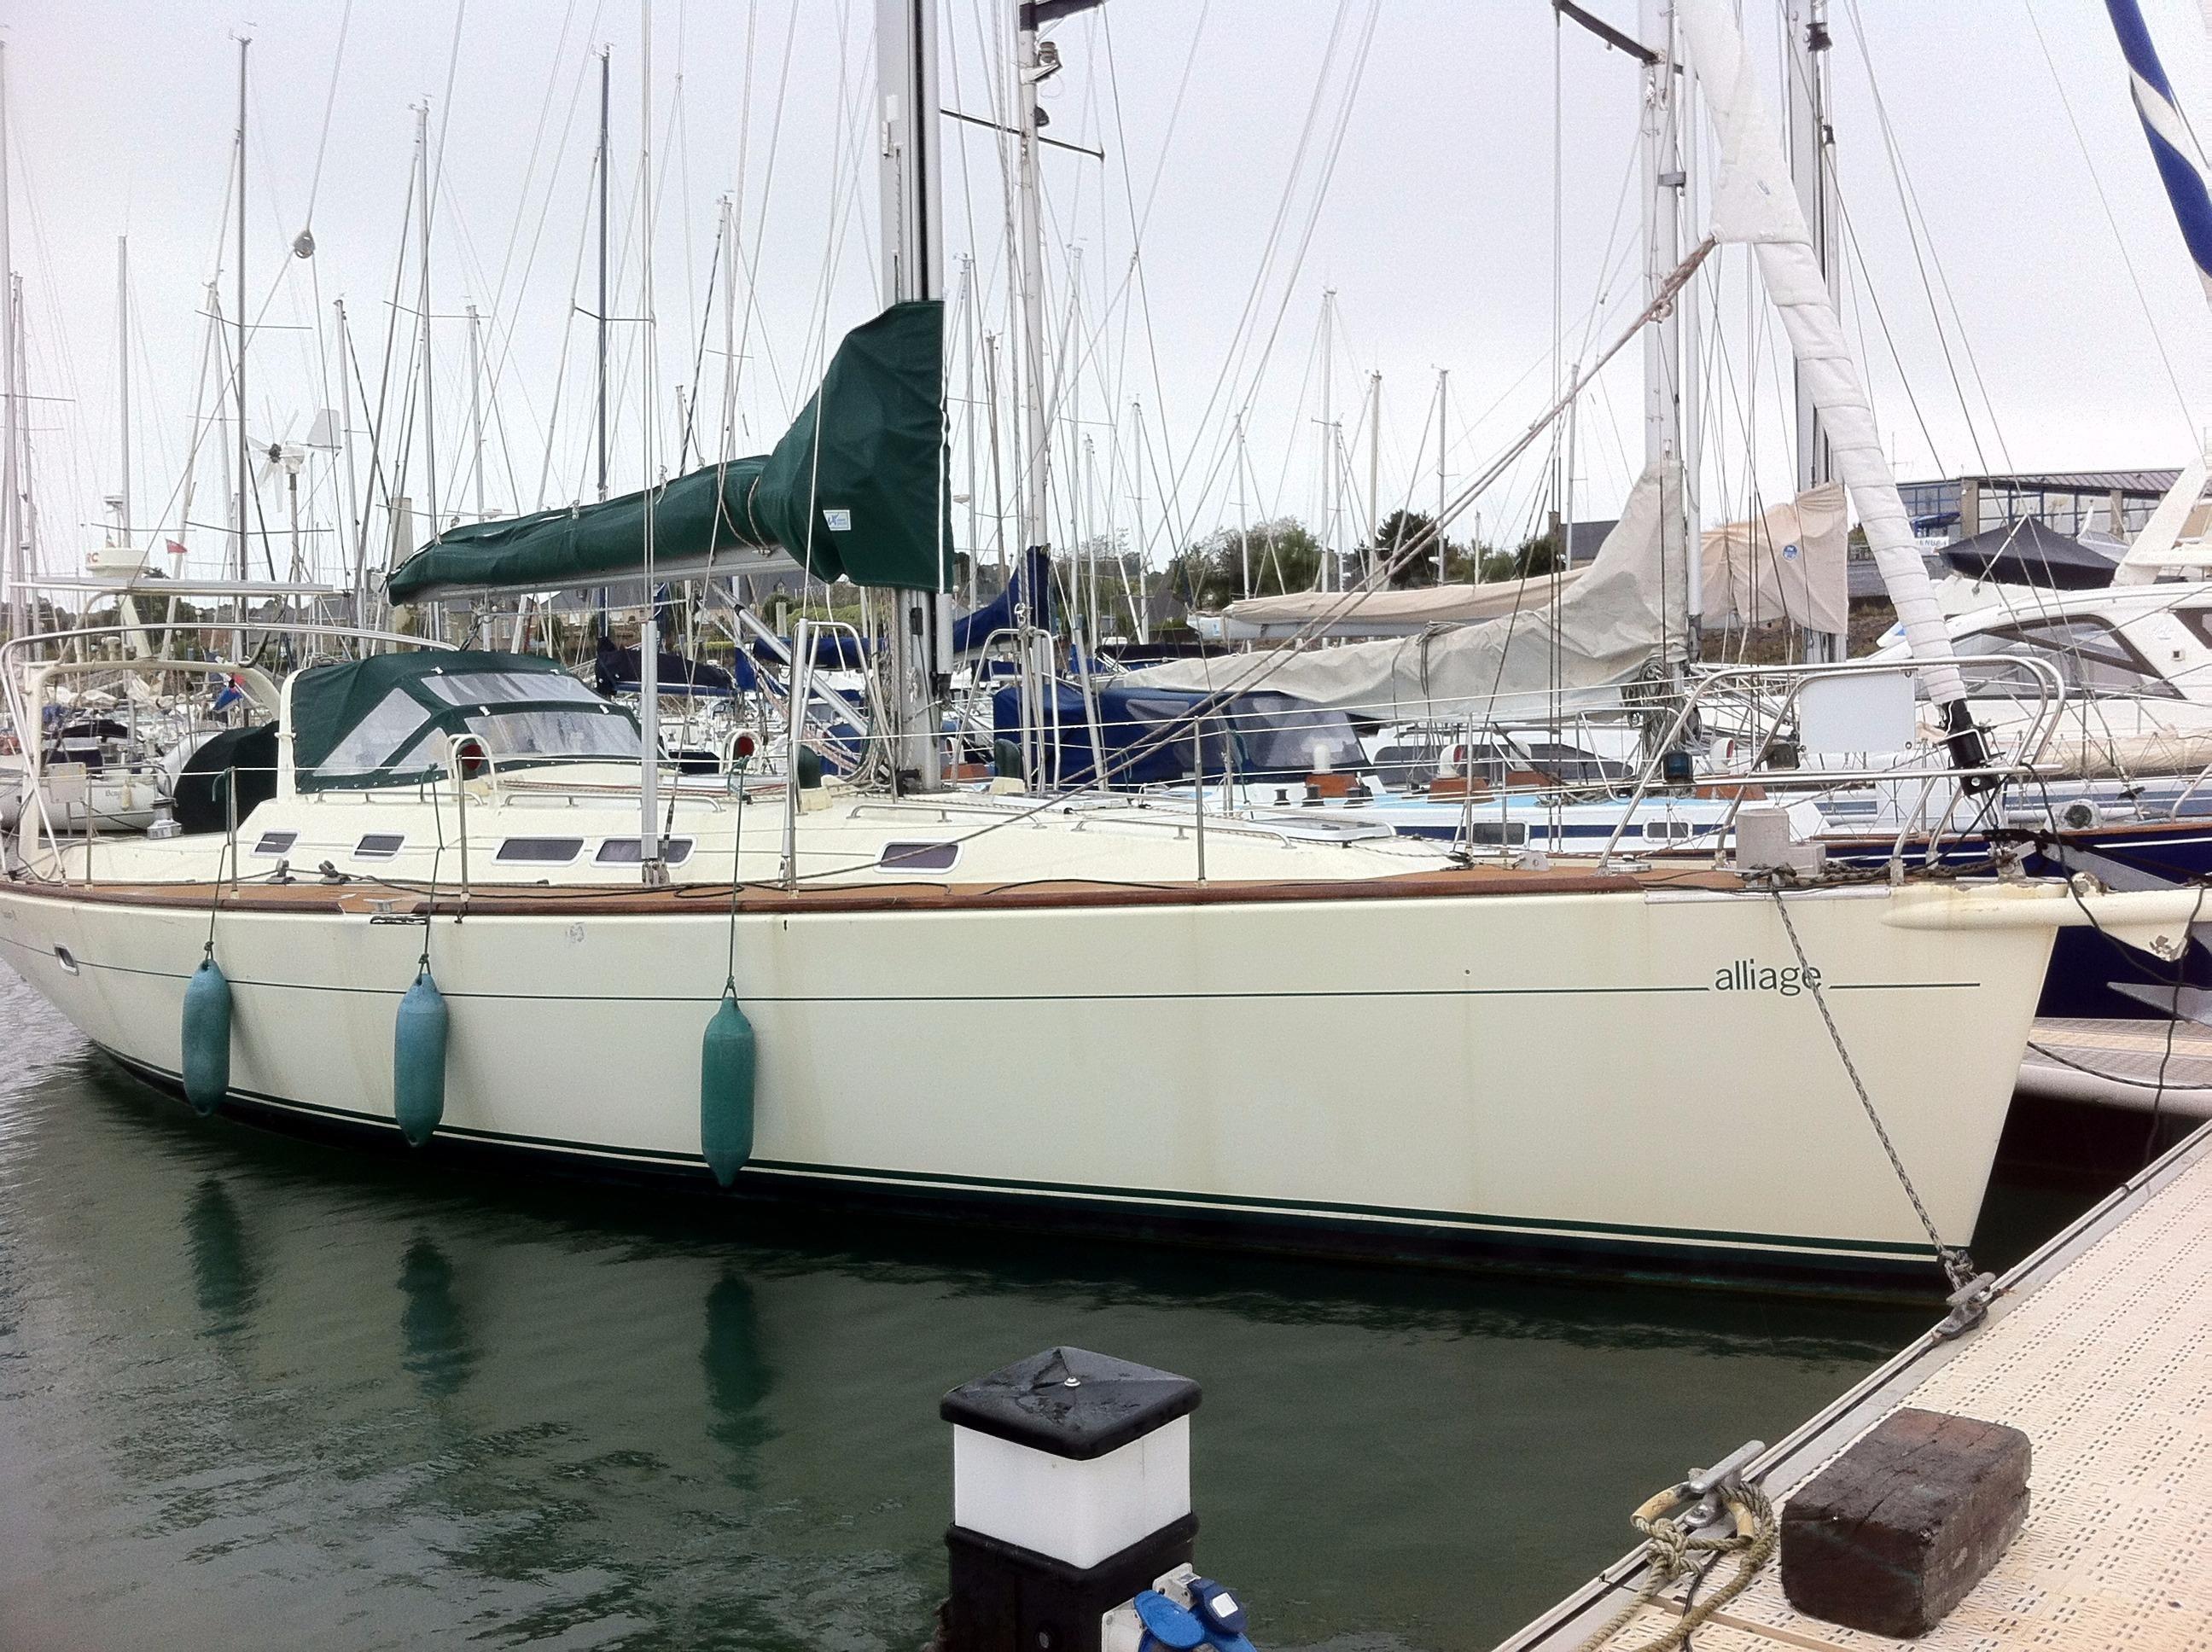 2003 alliage 44 voilier bateau vendre. Black Bedroom Furniture Sets. Home Design Ideas